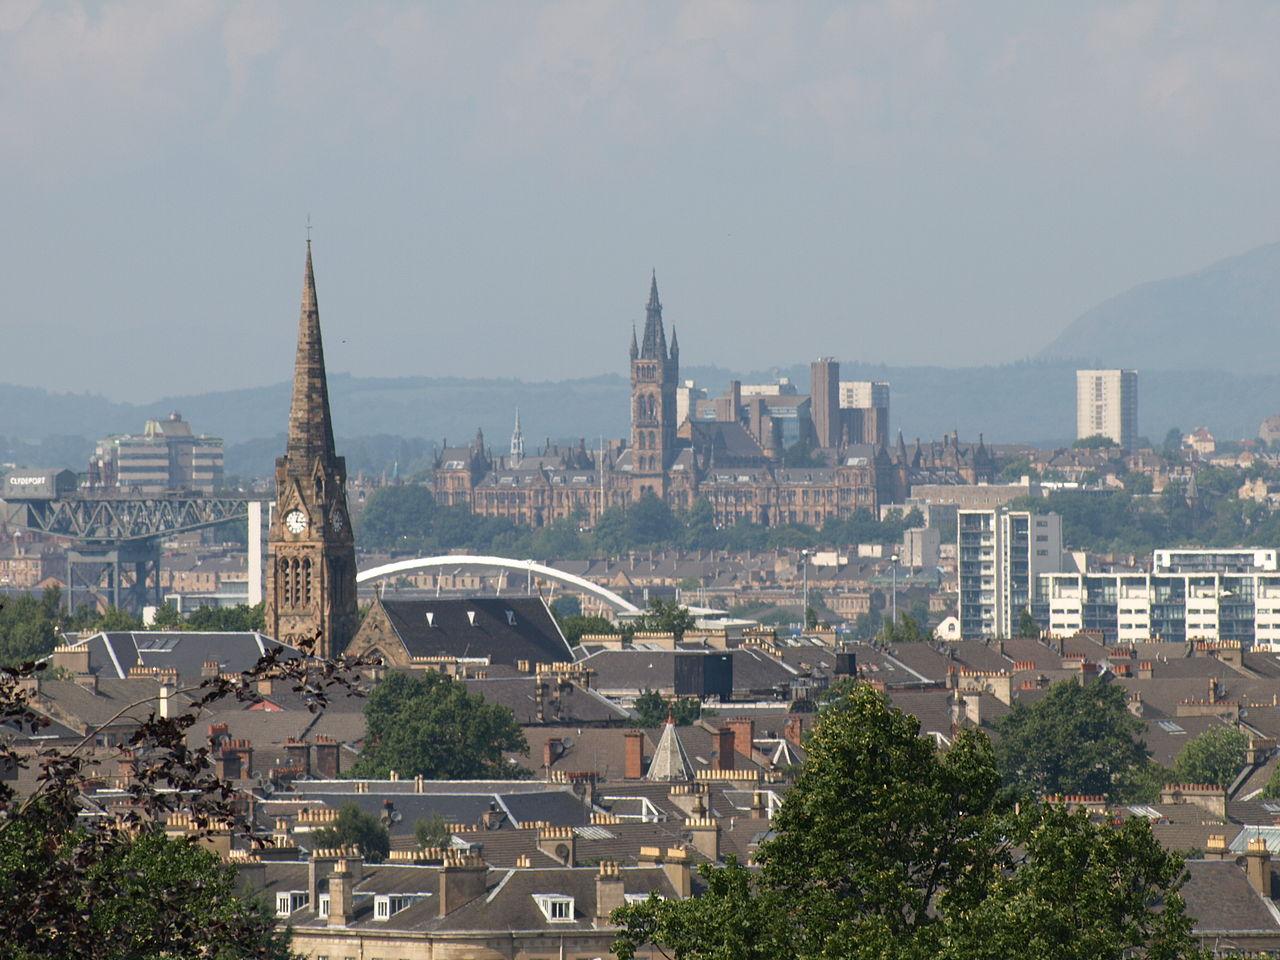 Glasgow. Image by  John Lindie  via Wikimedia Commons